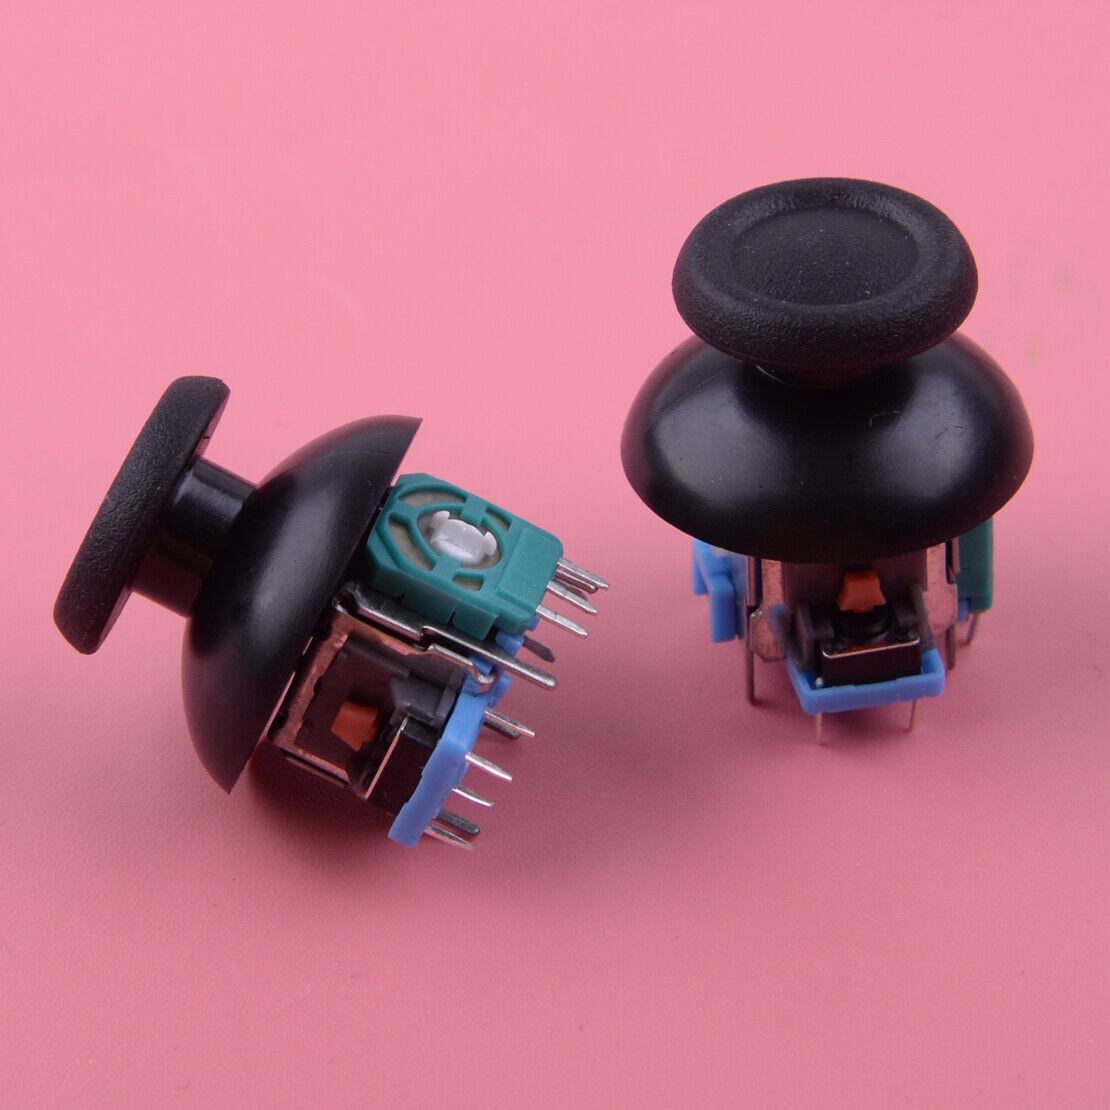 2pcs For PS4 Controller Analog Thumb Joystick Repair Kit Dualshock Replacement